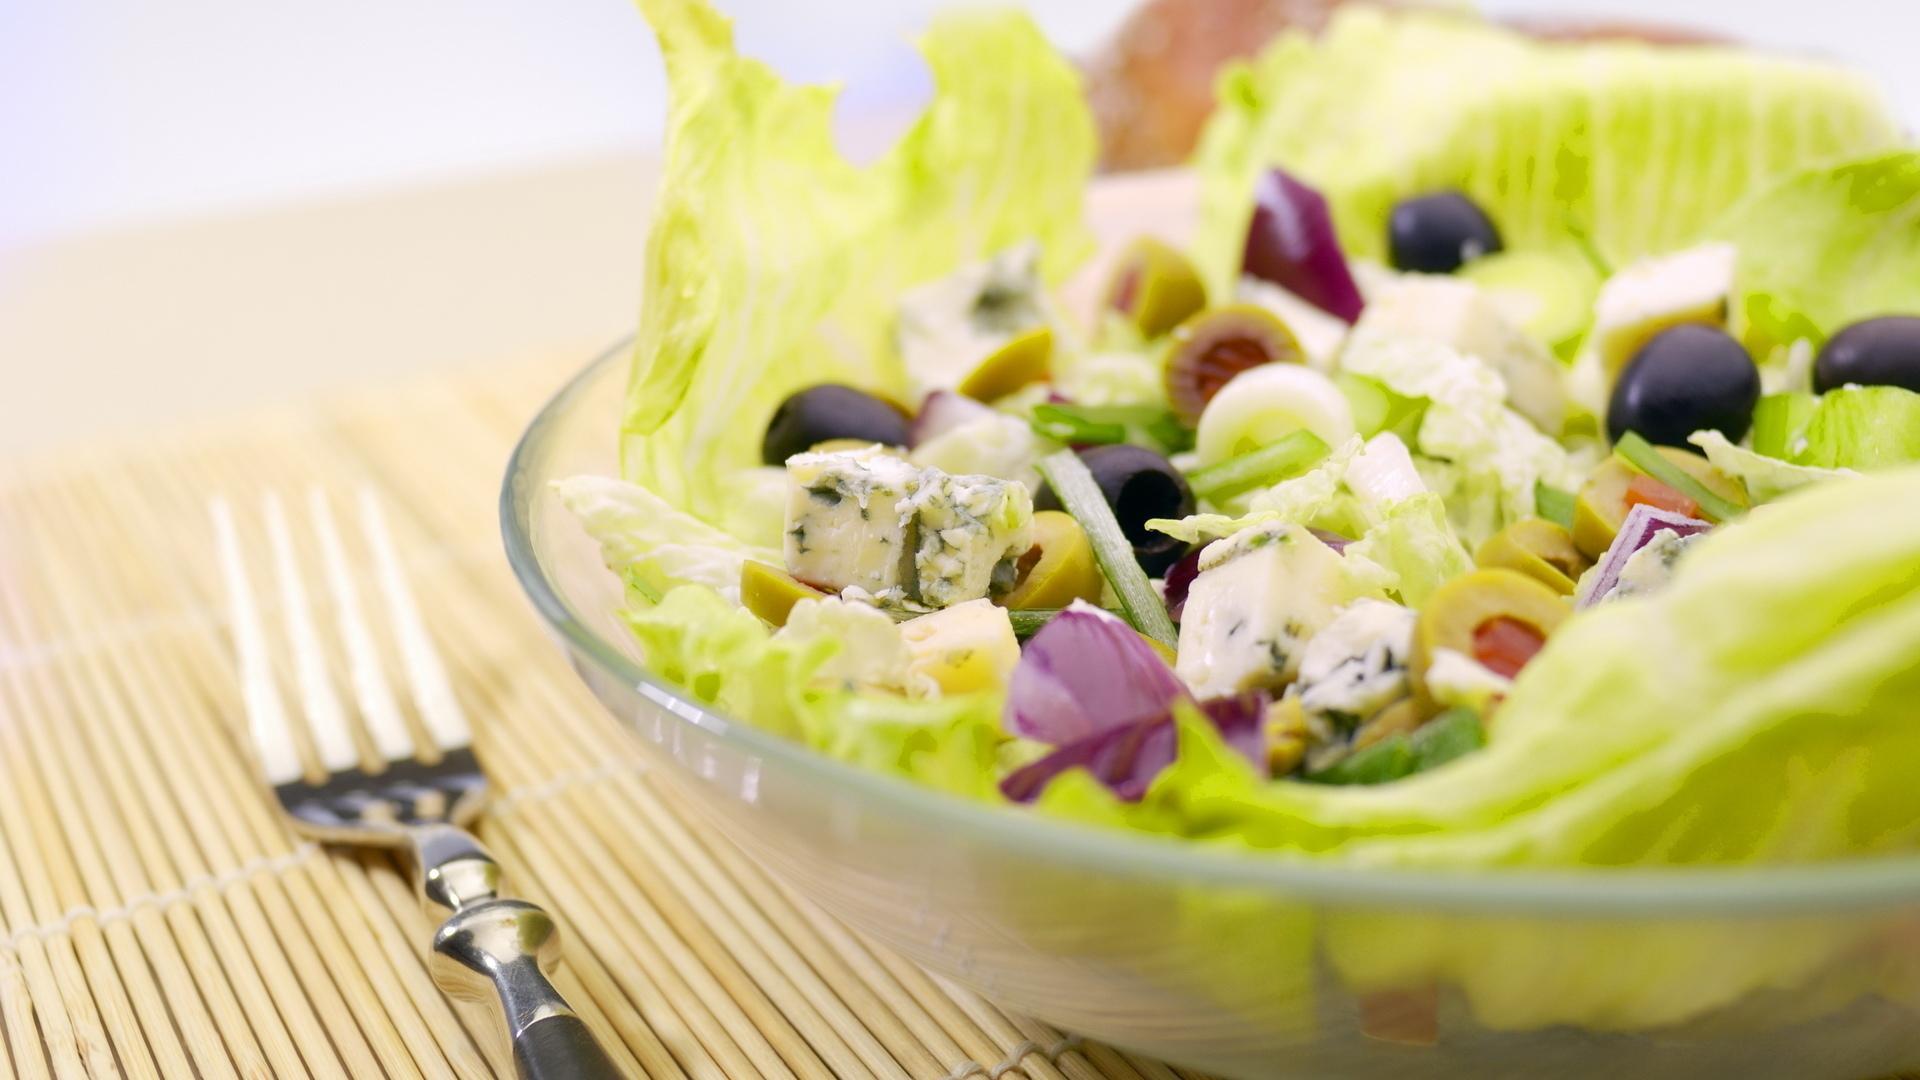 Salad wallpapers HD quality